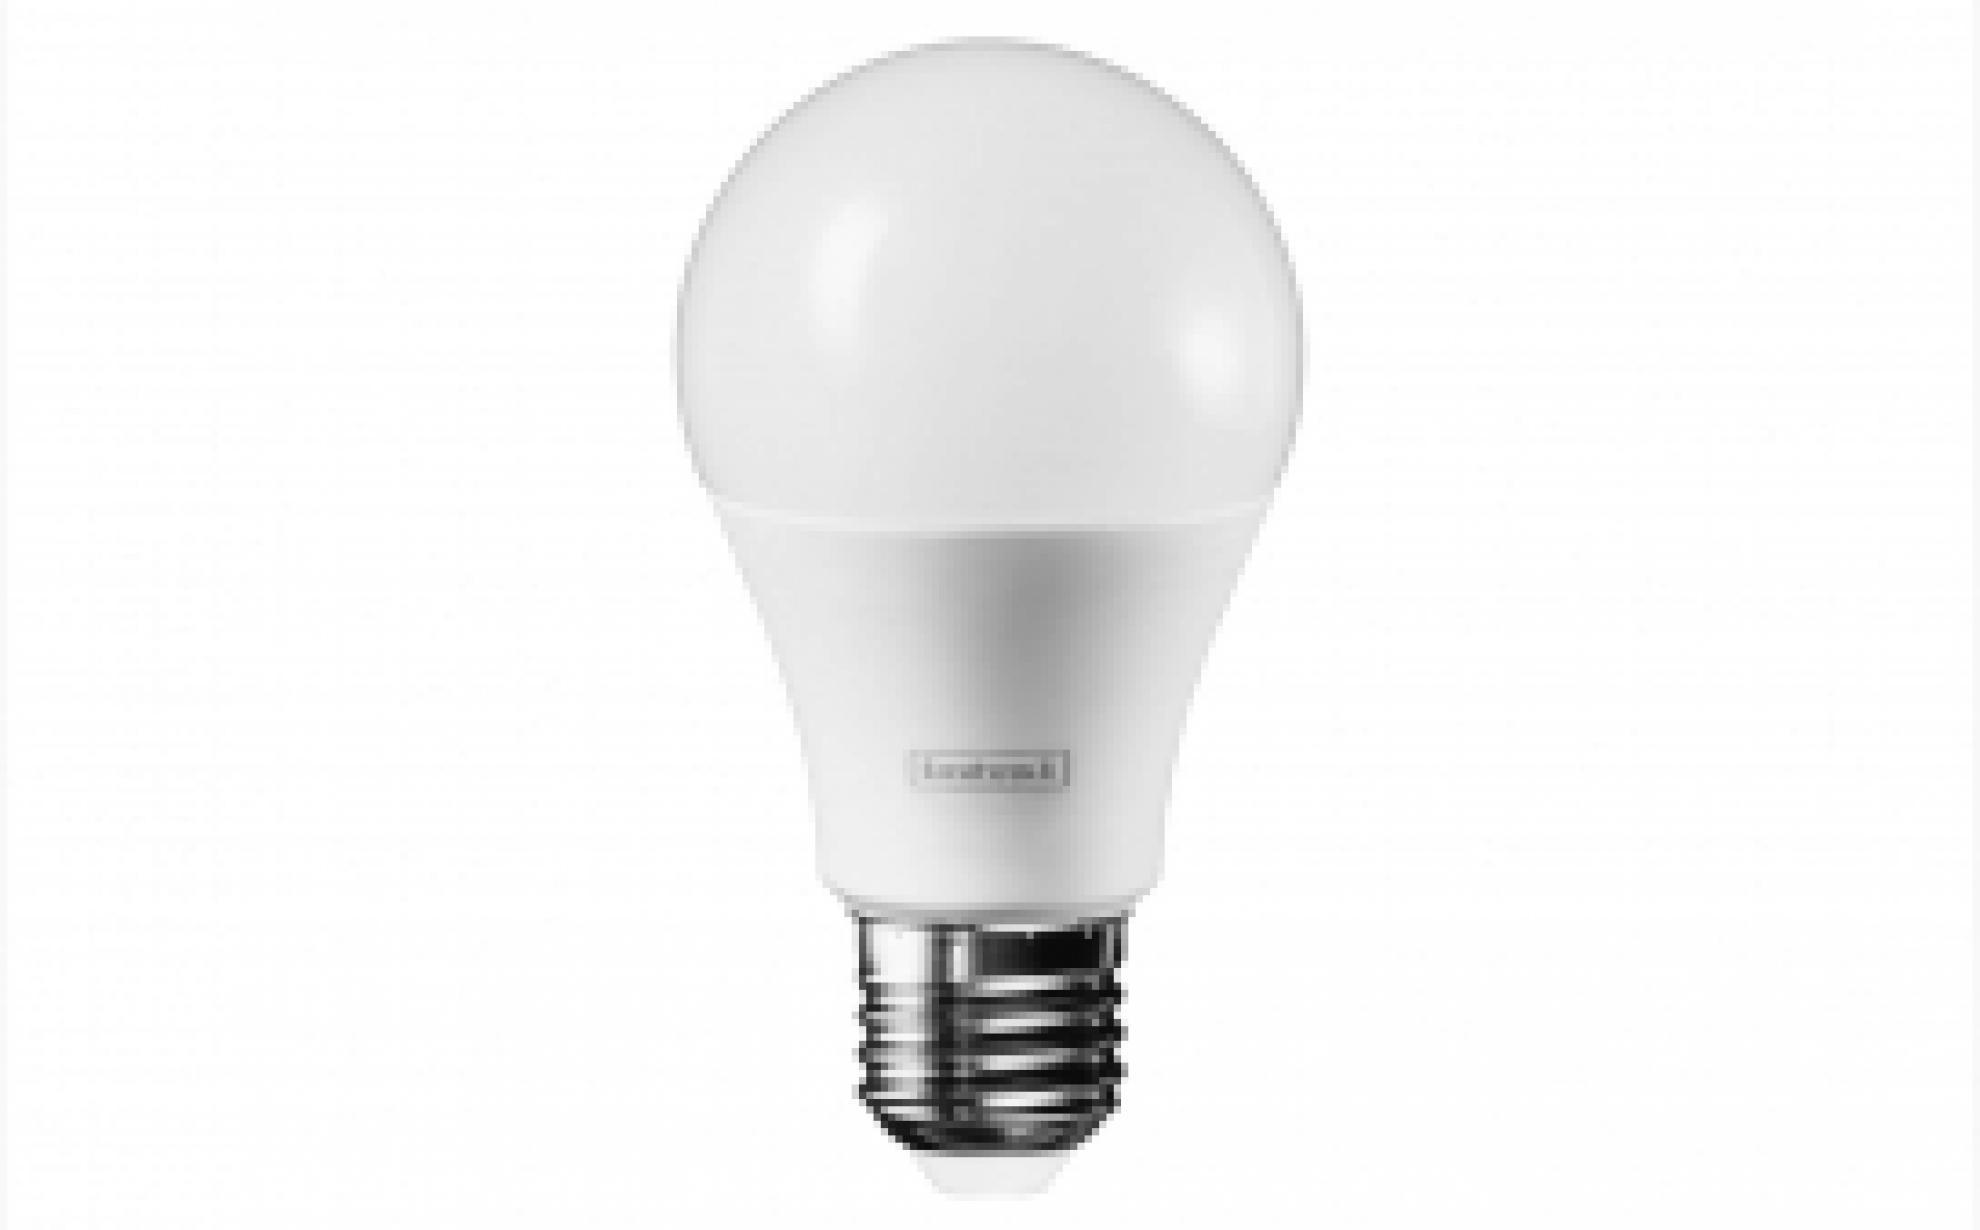 LAMPADA LED BULBO 16W 6500K BIV